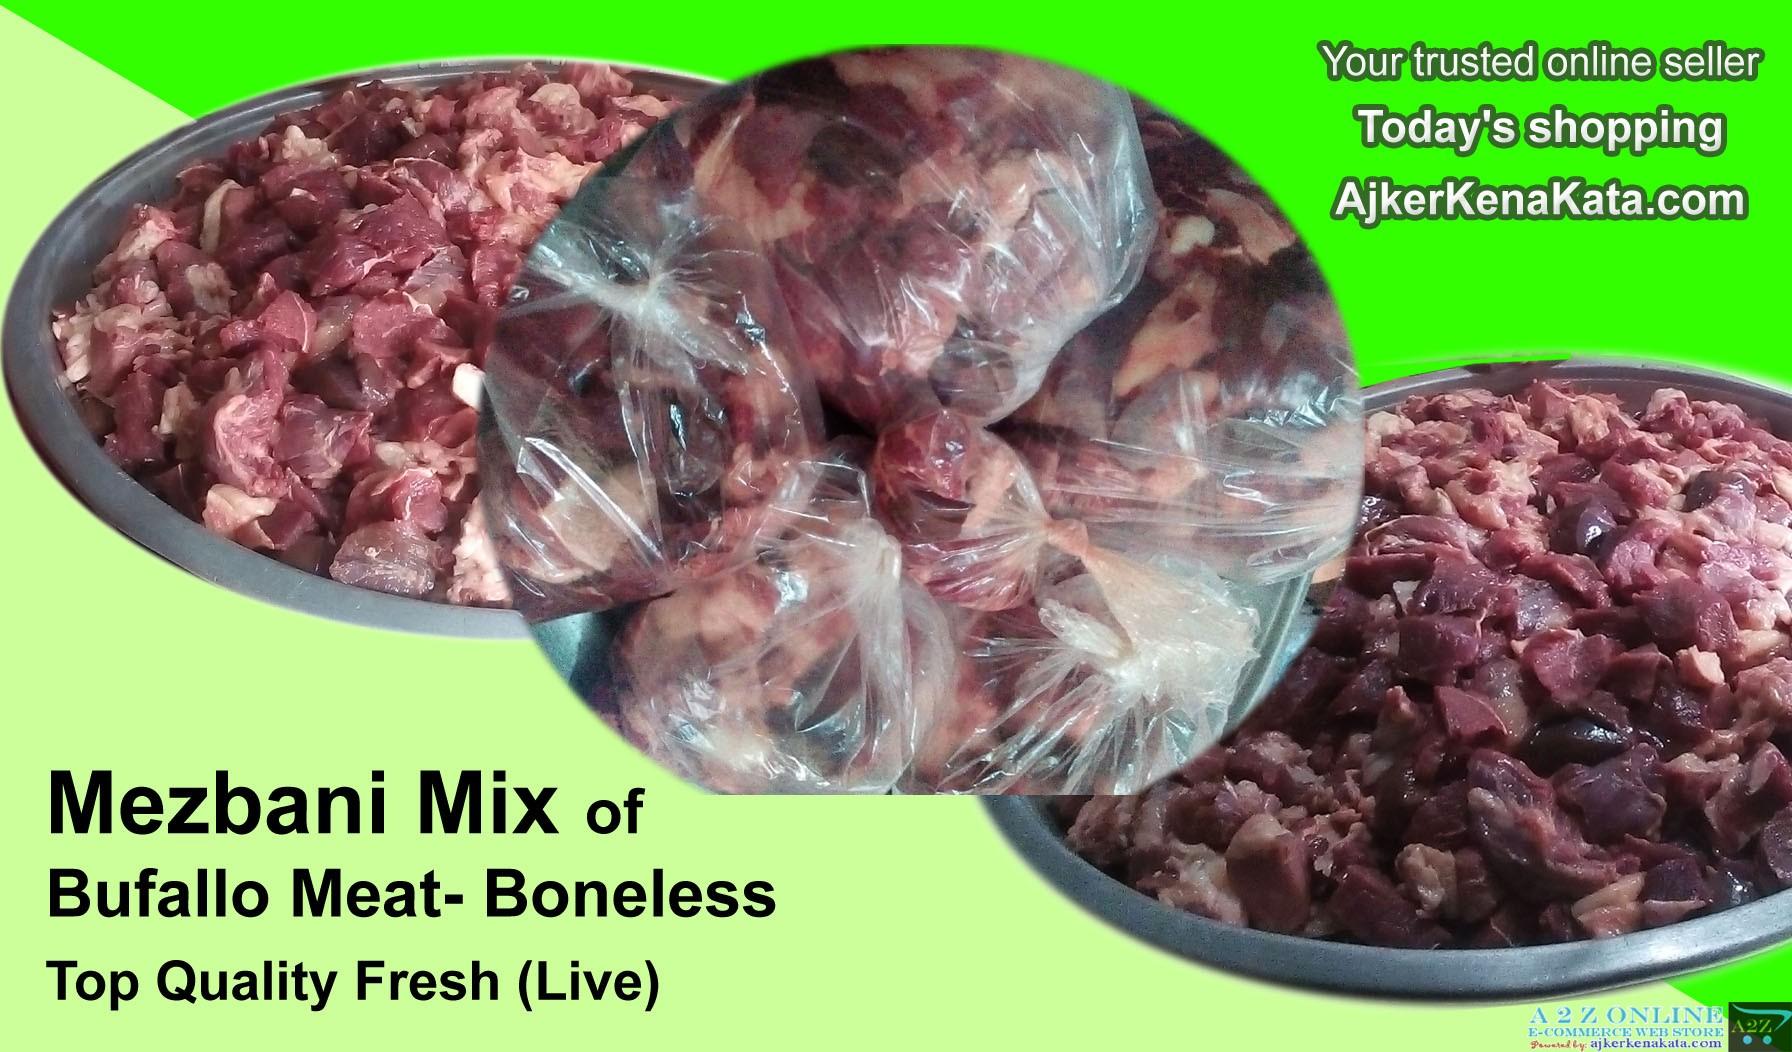 Buffalo Meat- মহিষের গোশত